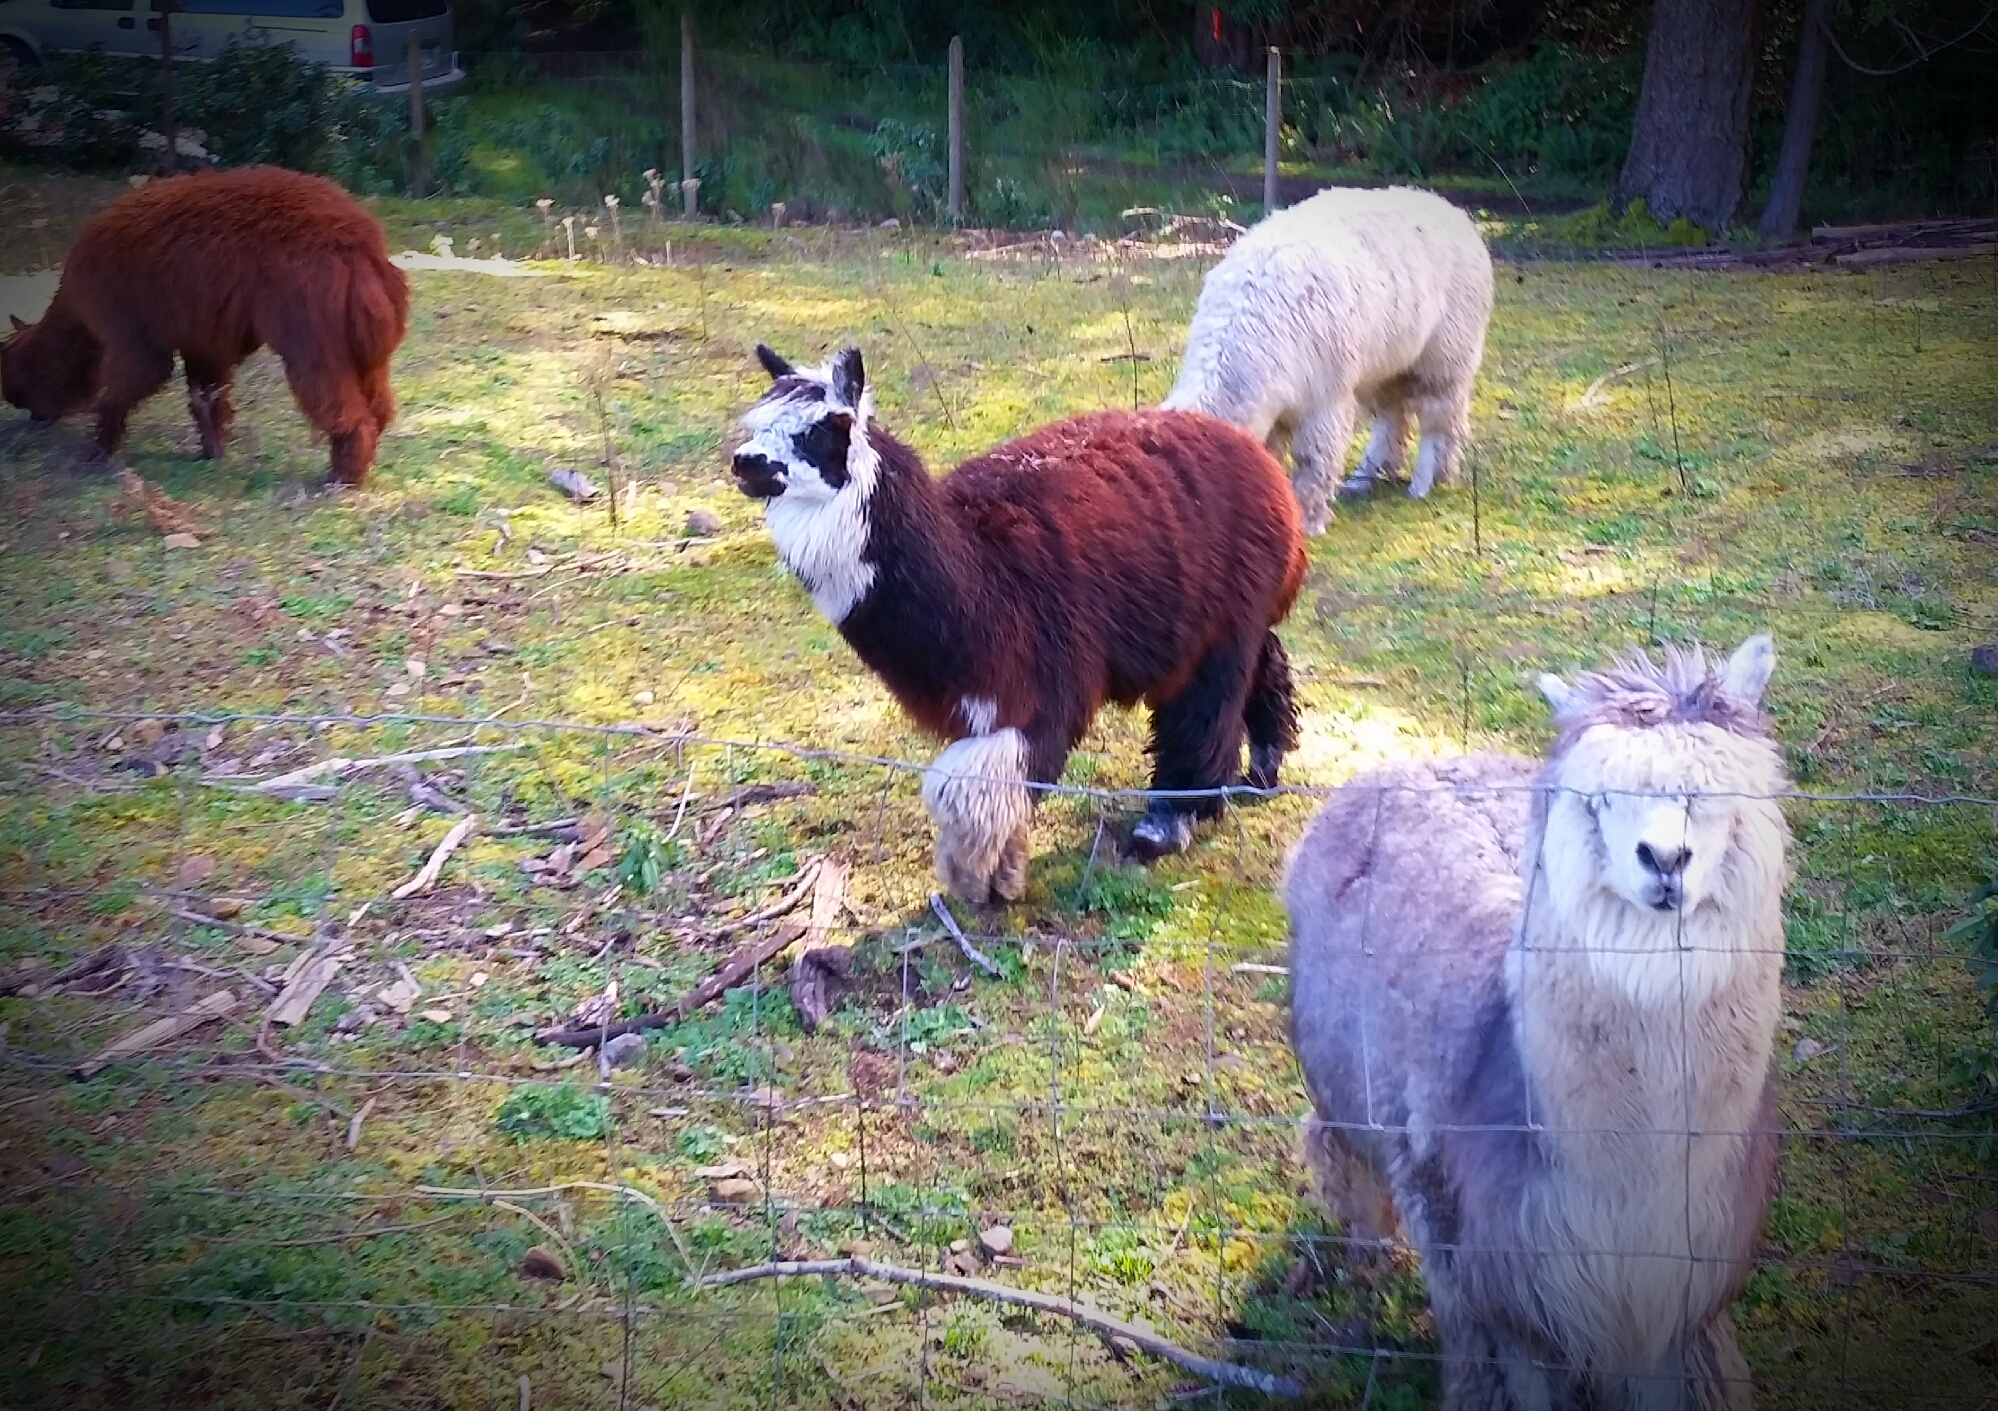 Justin and alpacas